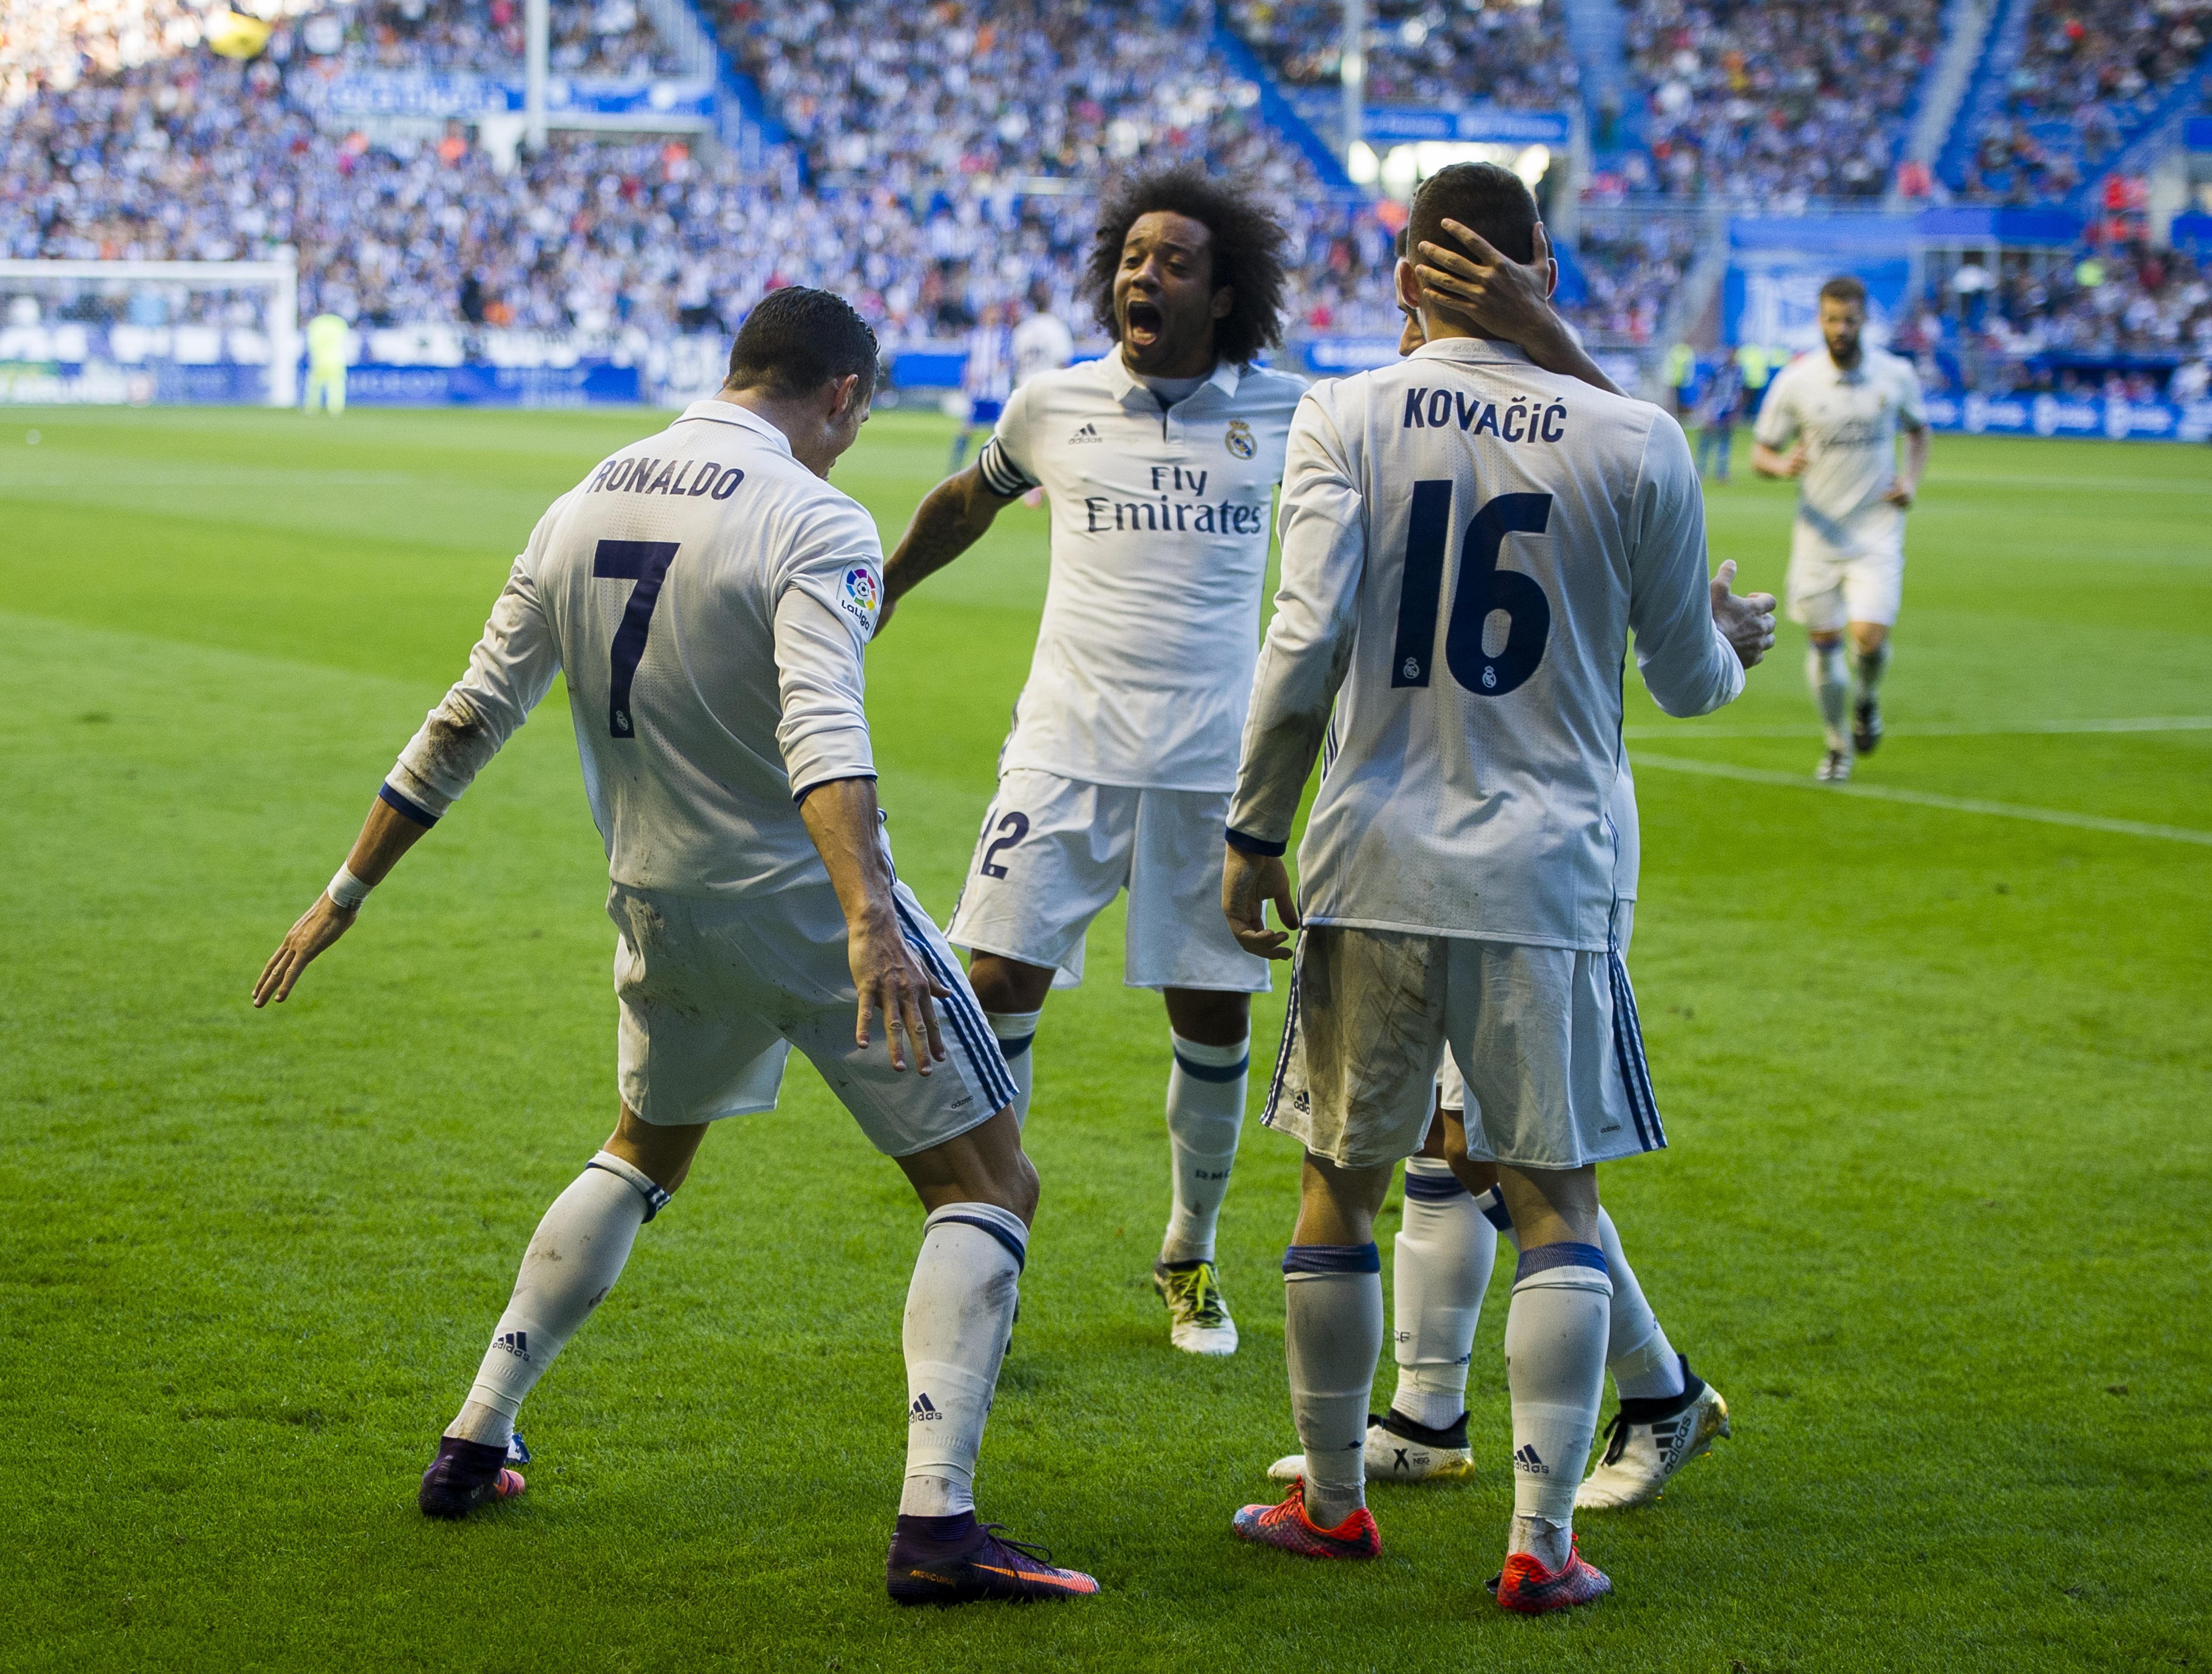 Real Madrid Vs Deportivo La Coruna Live Stream Watch La